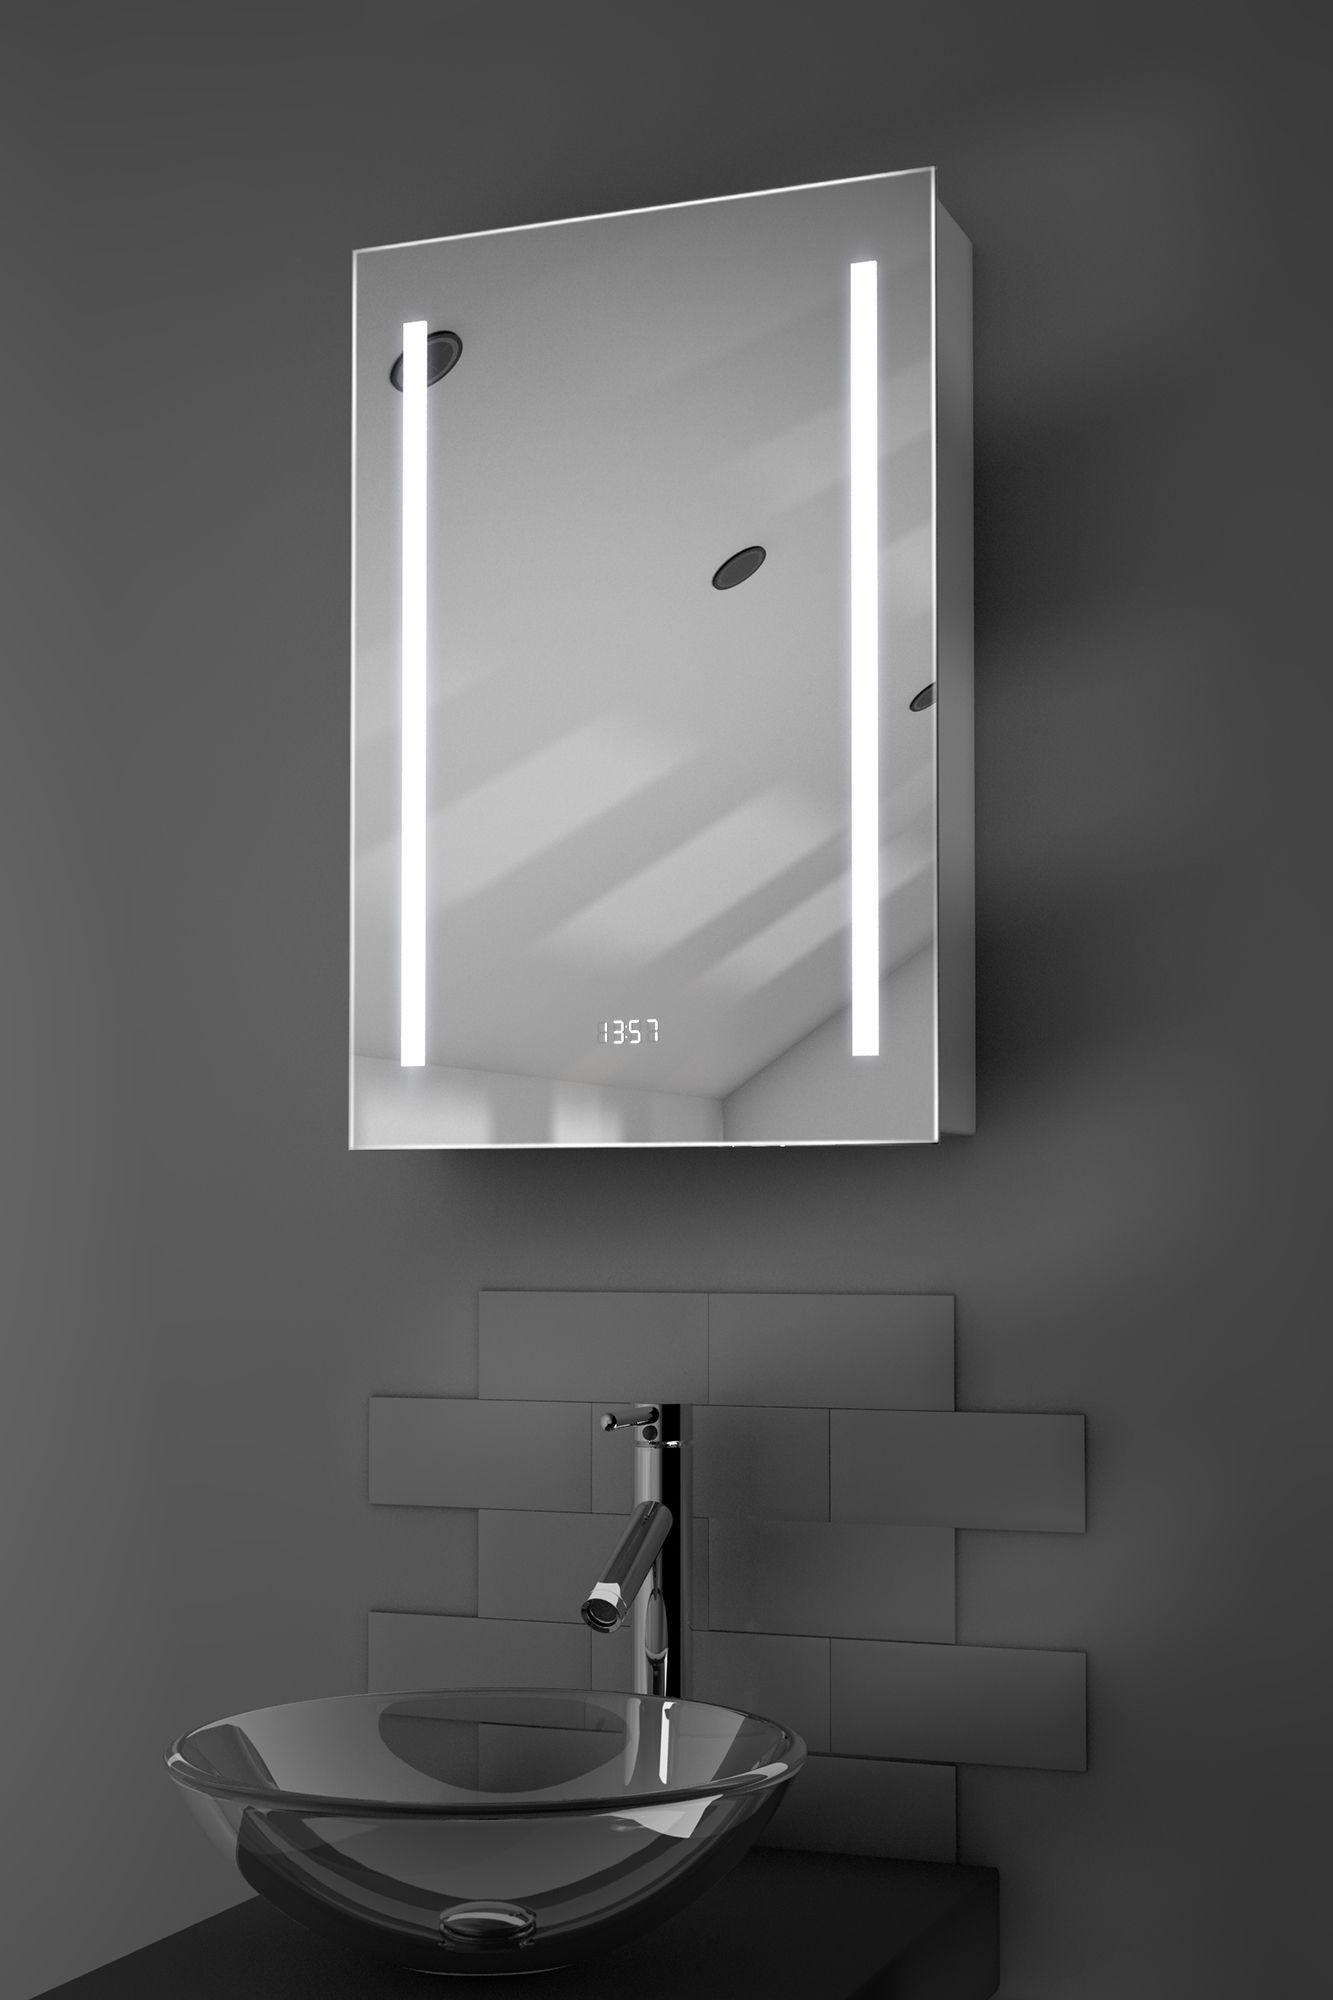 Calais Clock Led Bathroom Cabinet With Demister Pad Sensor U0026